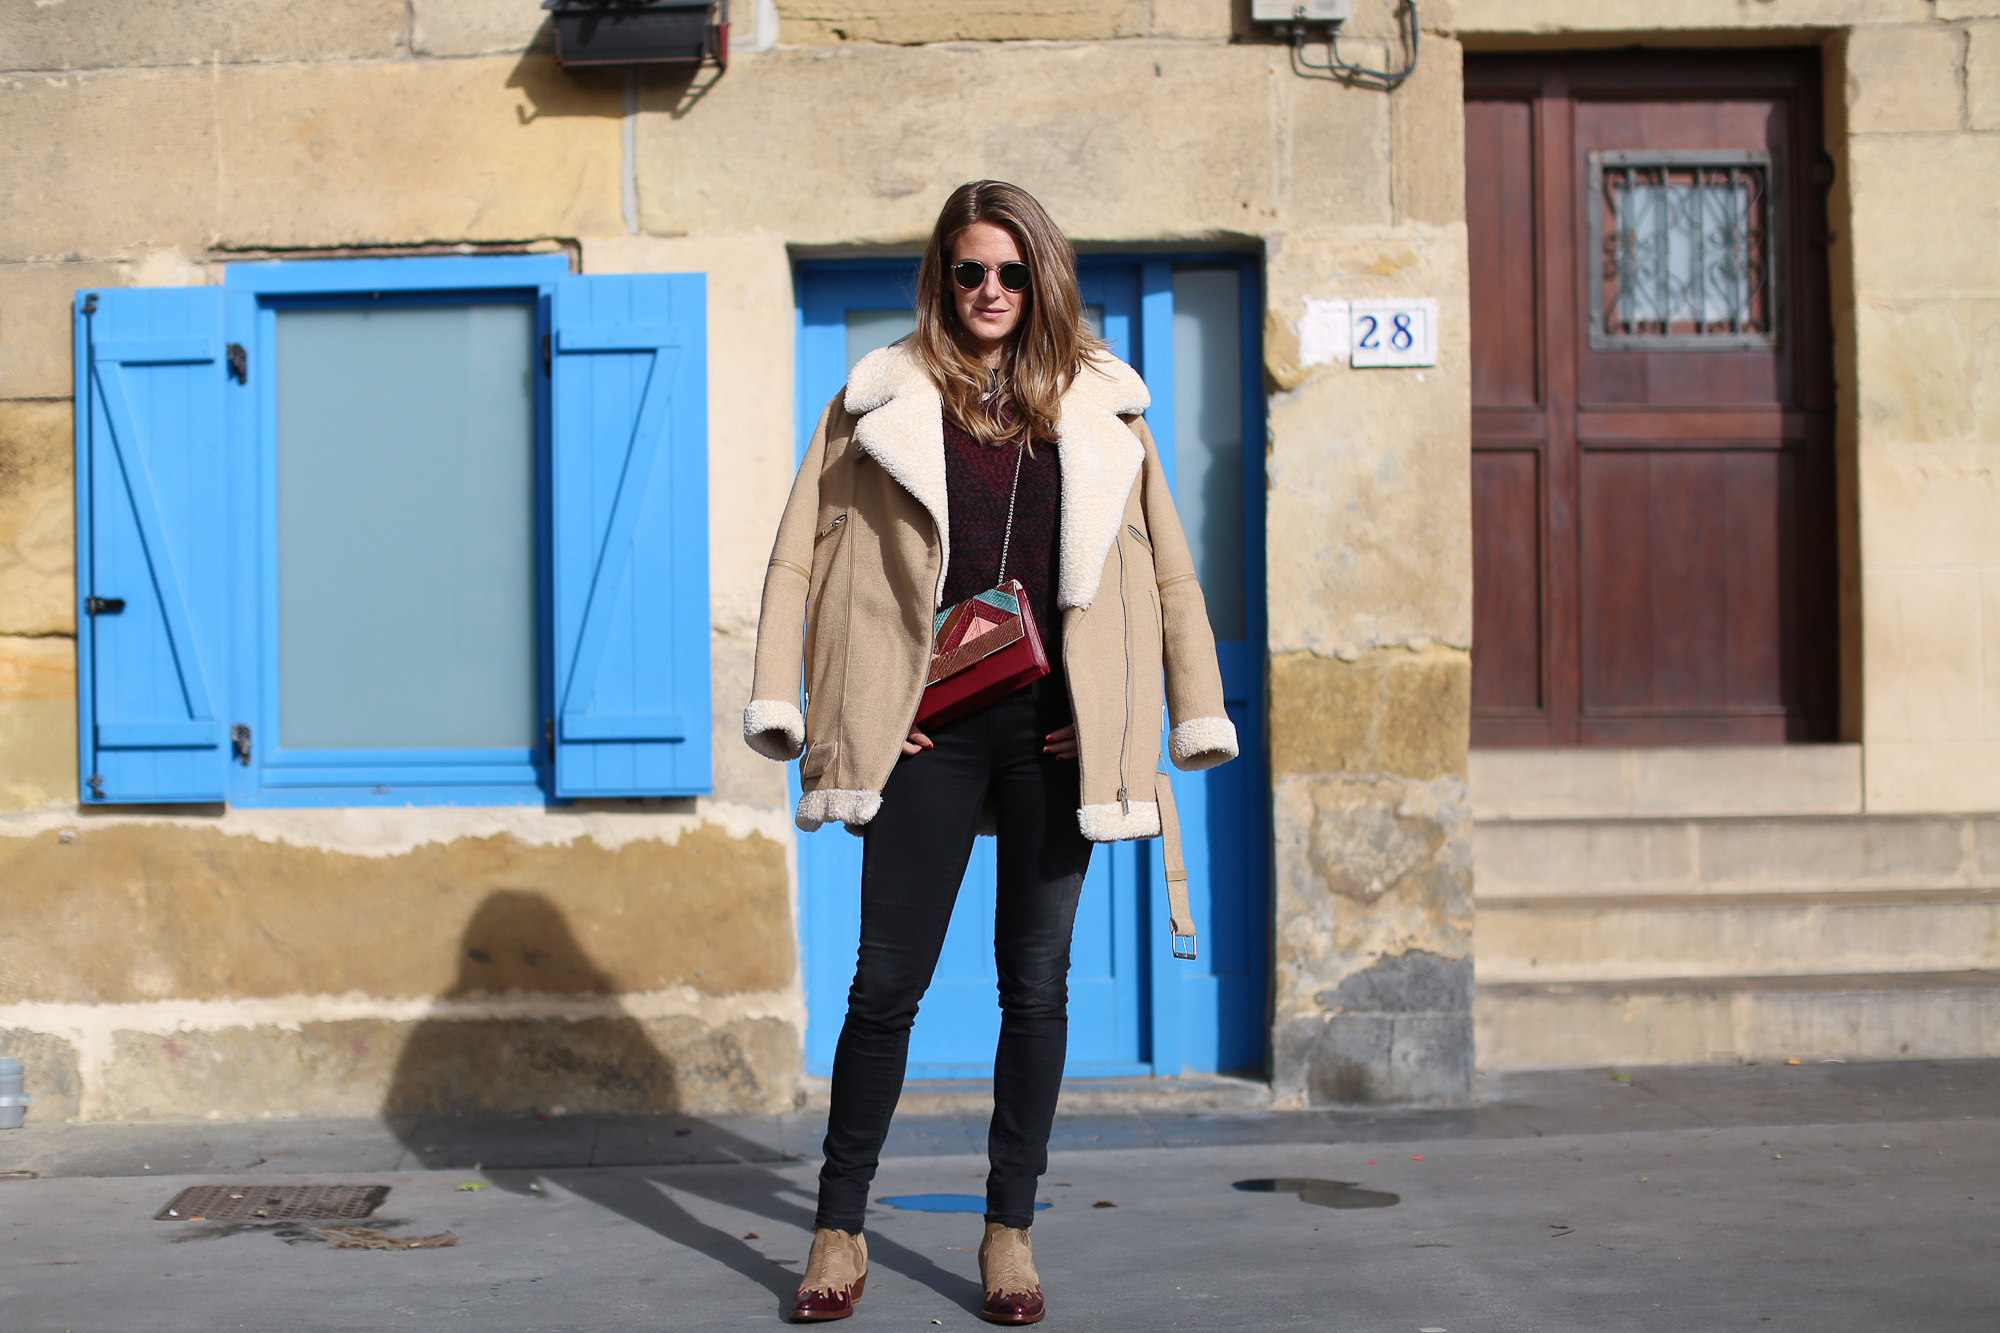 Clochet_streetstyle_fashionblogger_zadig&voltaire_suedewesternankleboots_cowboyboots_aviatorjacket_titamadridespiga-3